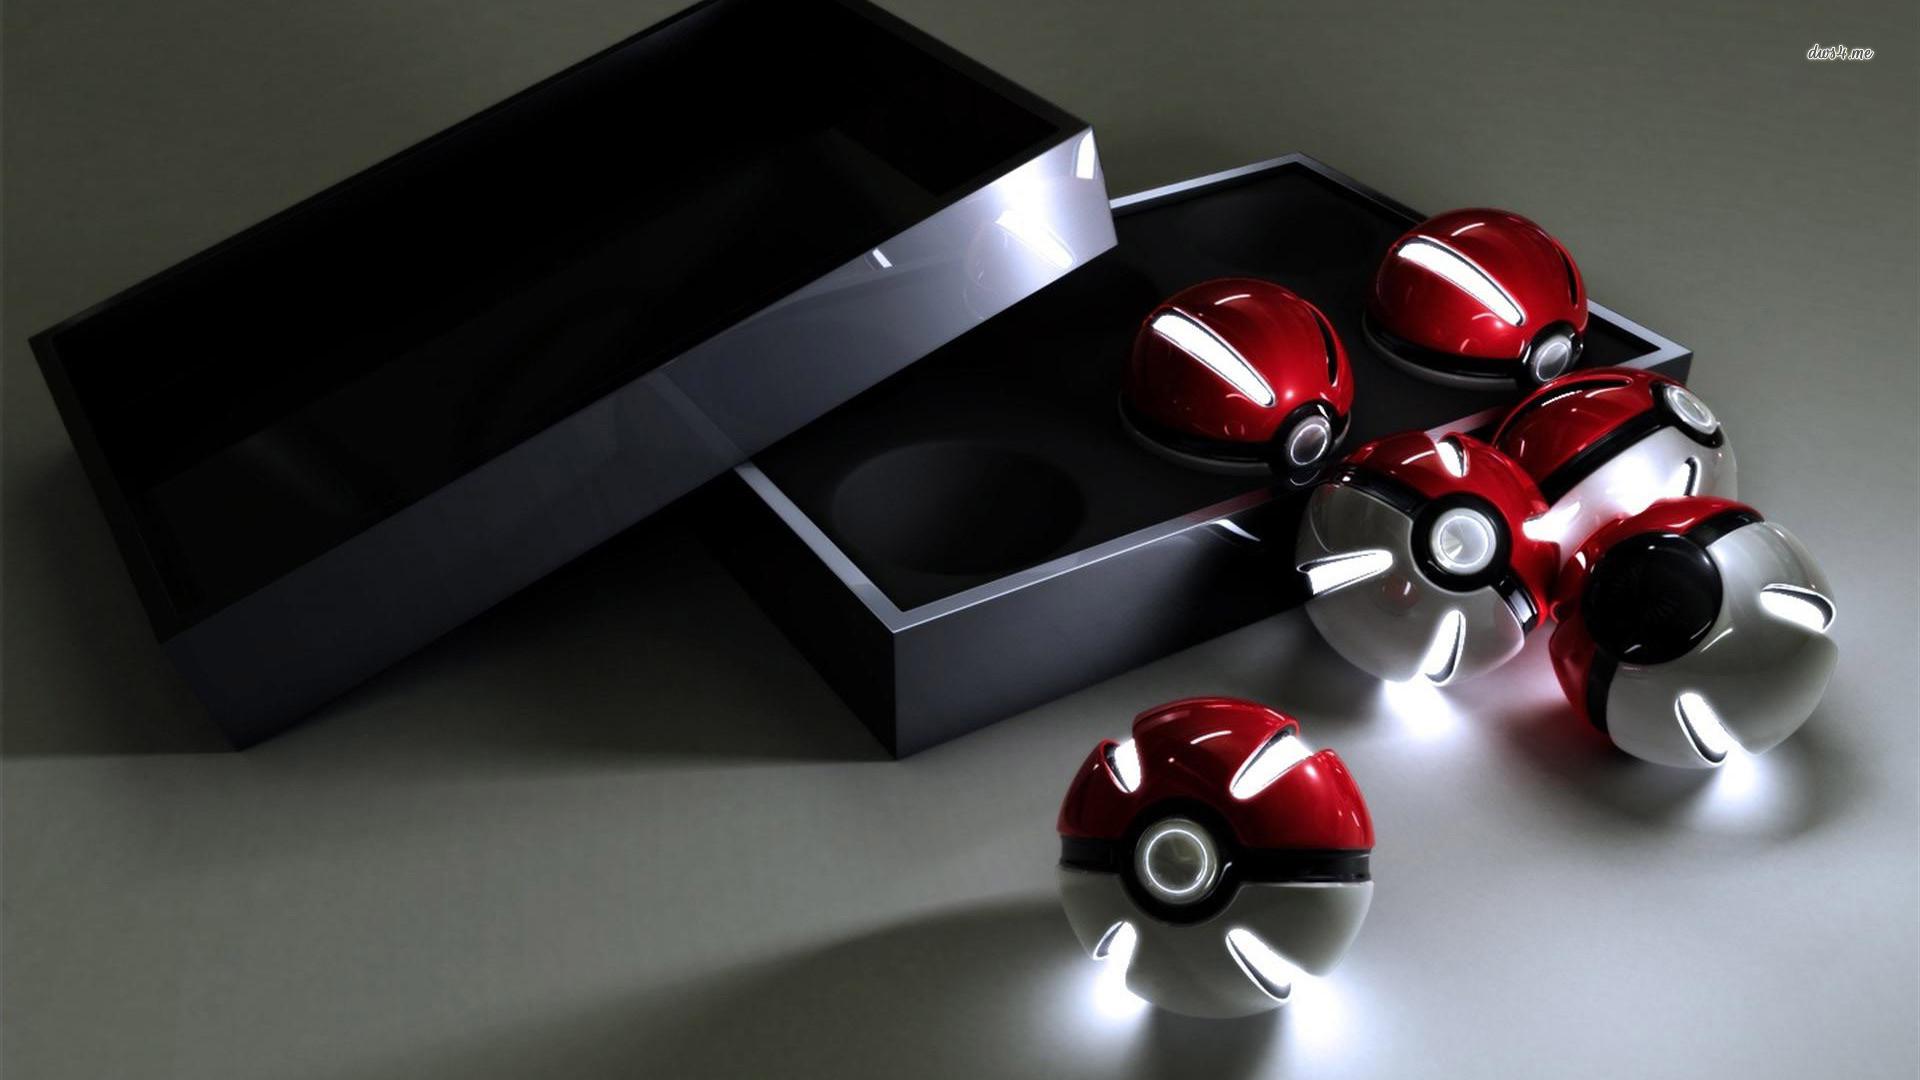 Pokemon 3D Wallpaper | 3D Pokemon Pokeball